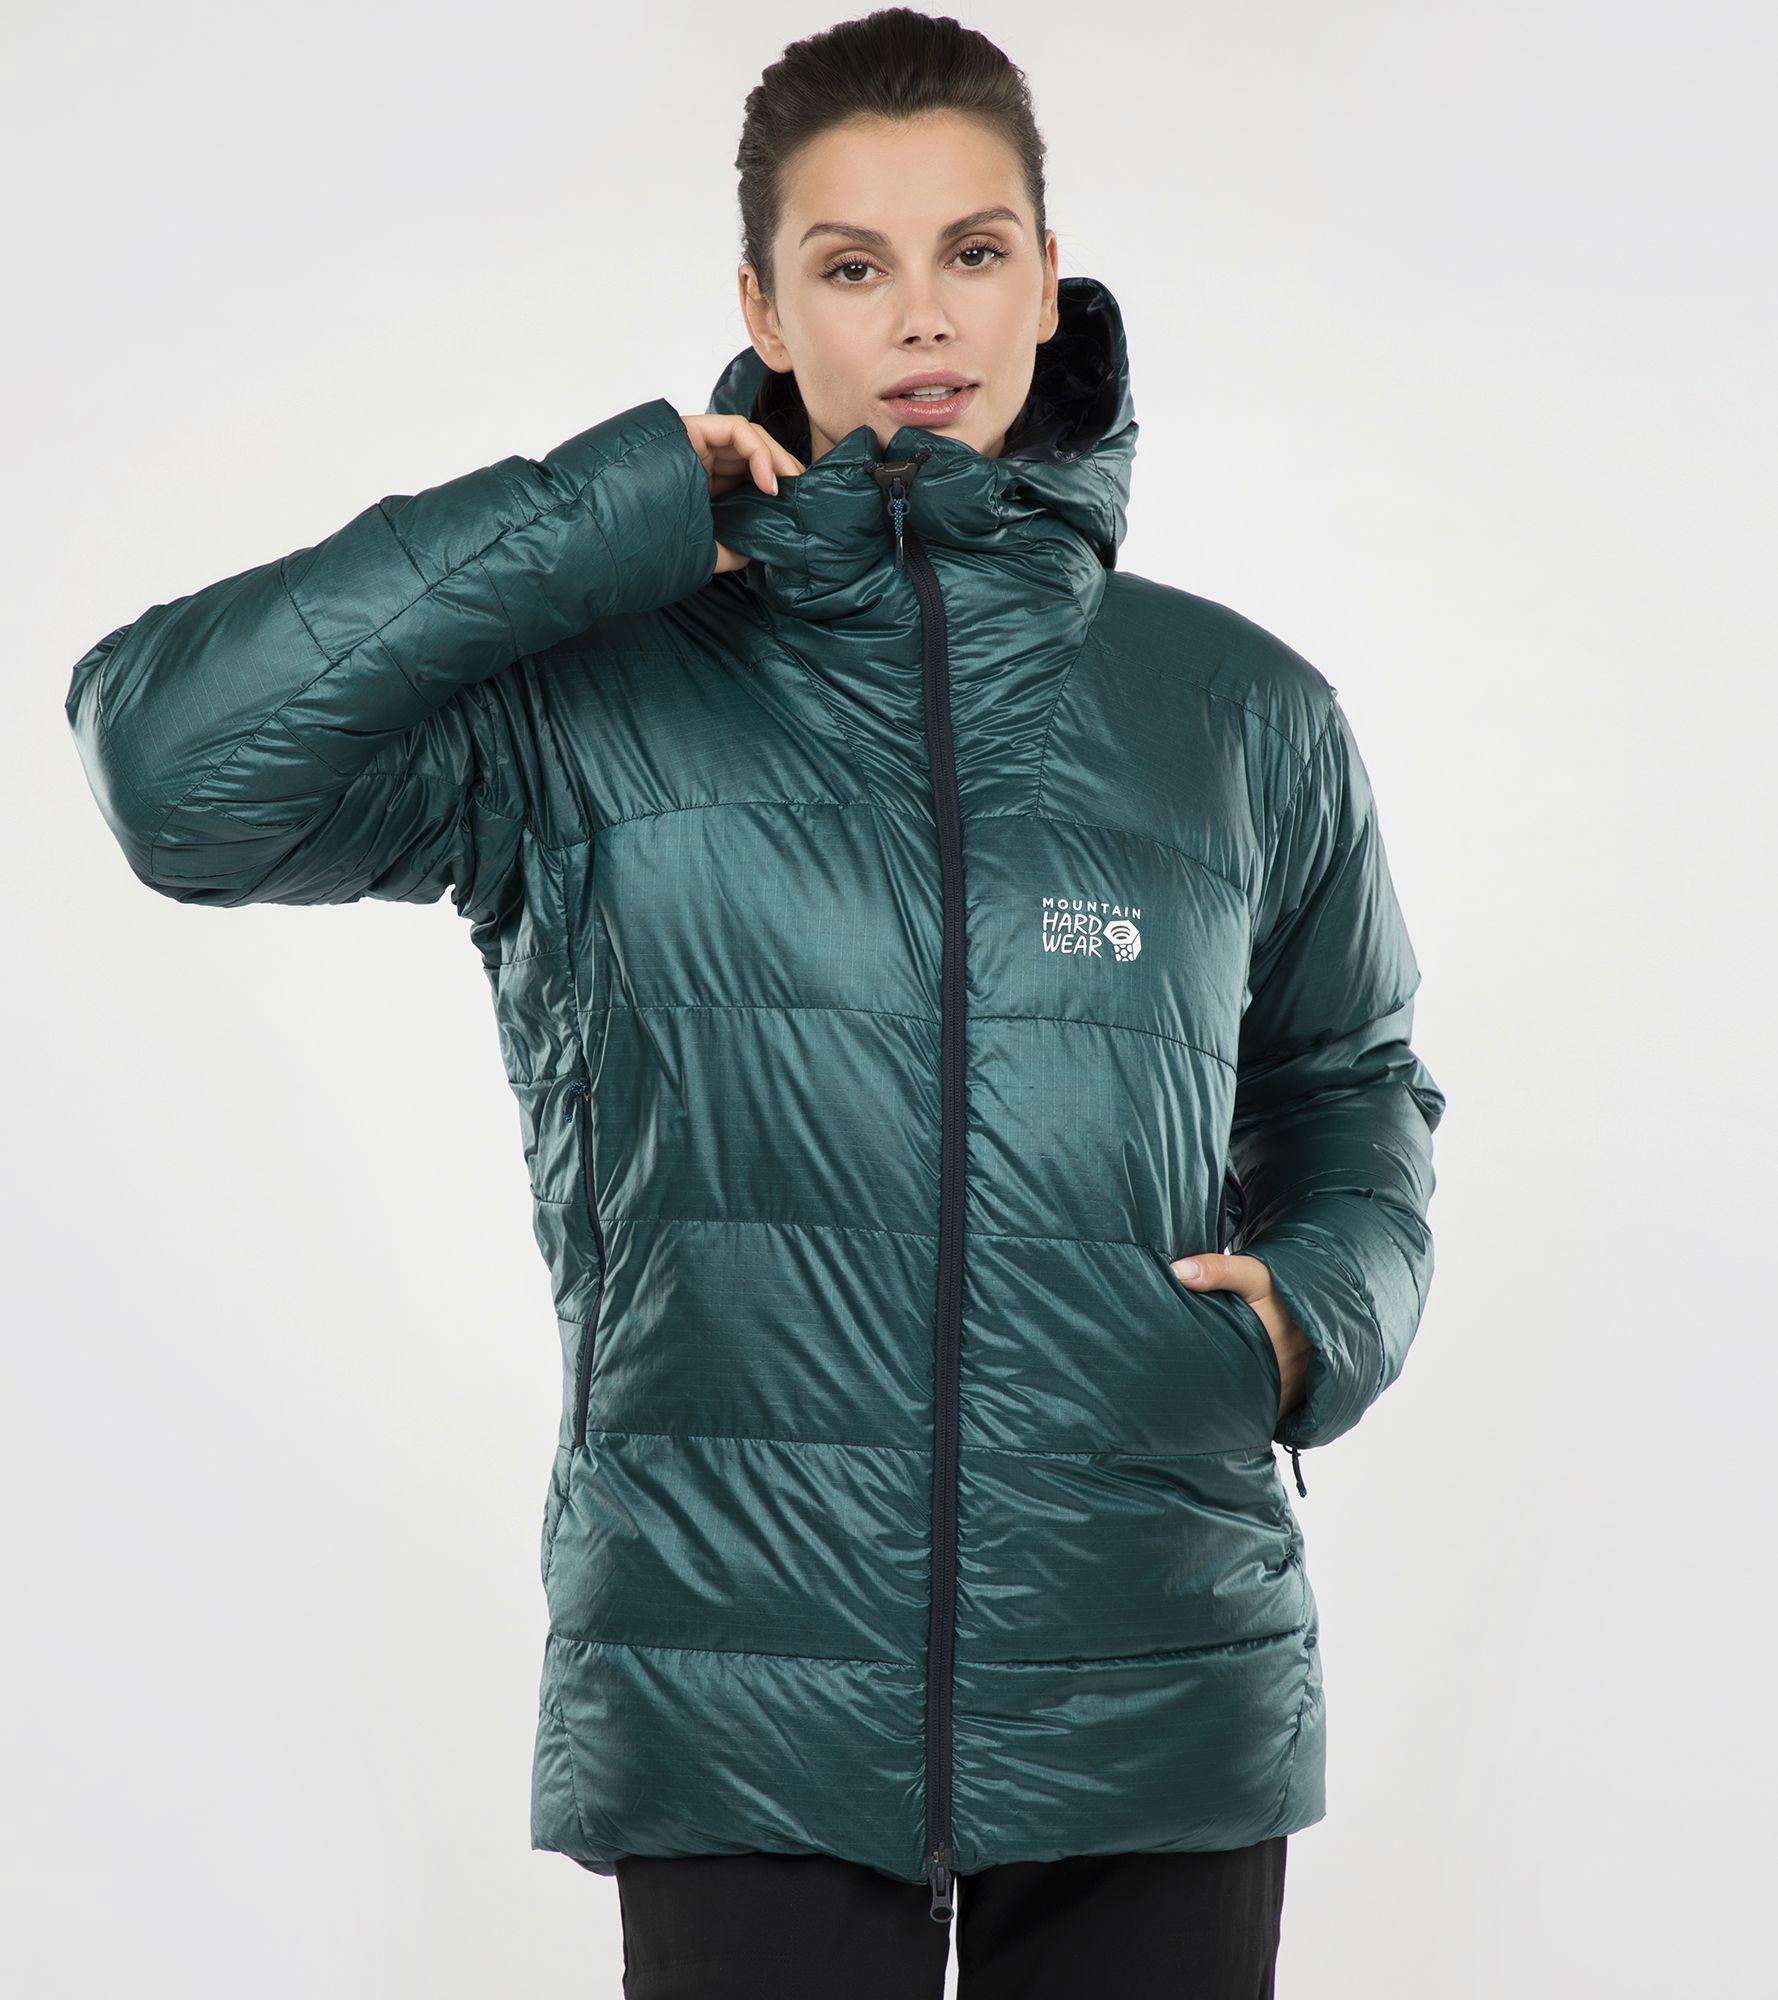 Mountain Hardwear Куртка пуховая женская Mountain Hardwear Phantom™, размер 50 цена